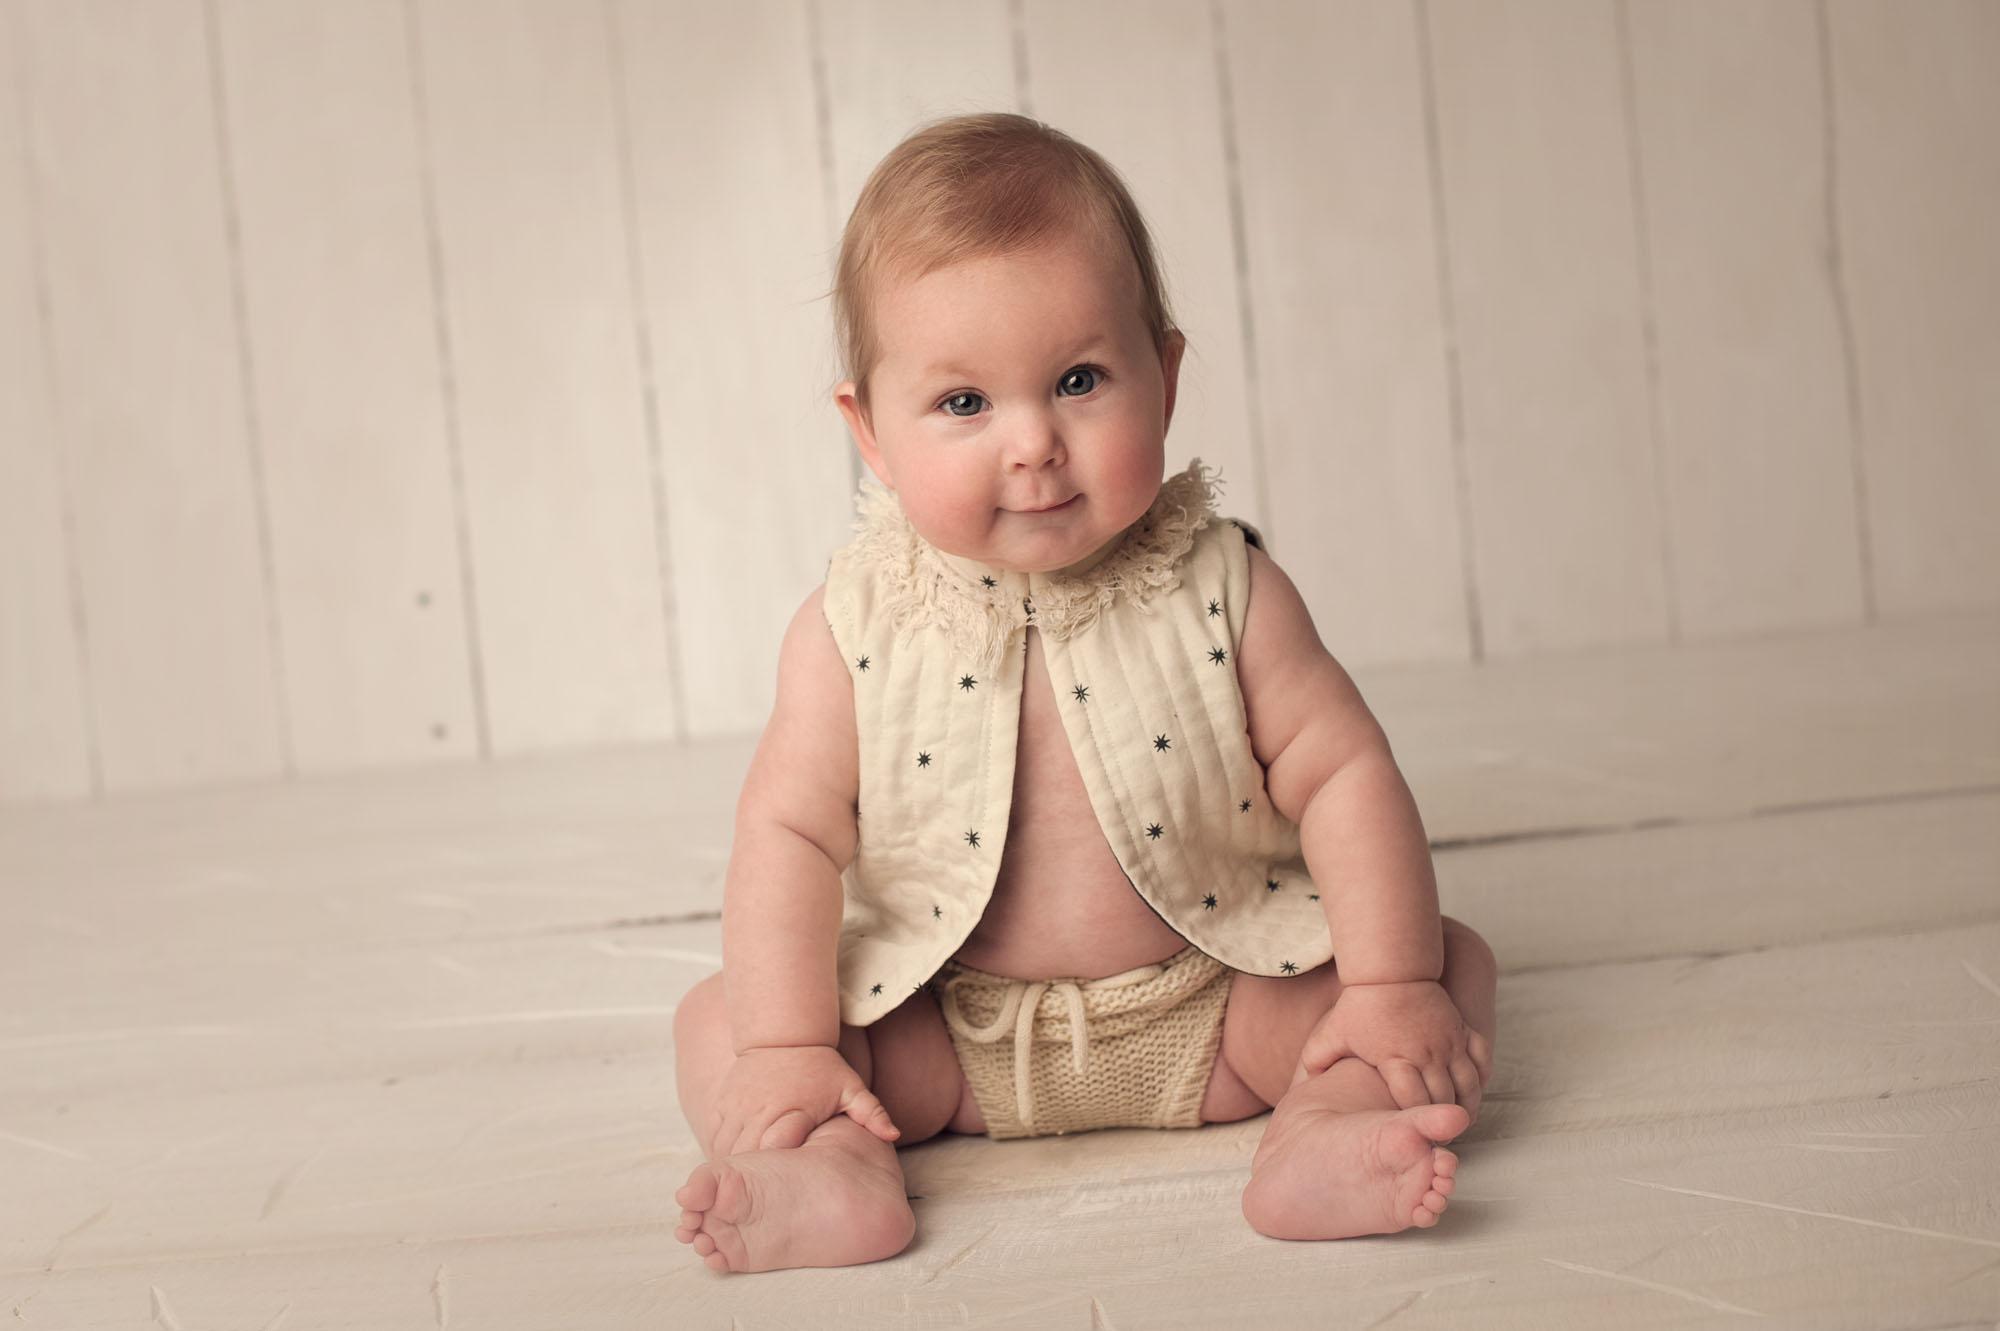 newbornphotographermadisonbornarchivalco_10.jpg